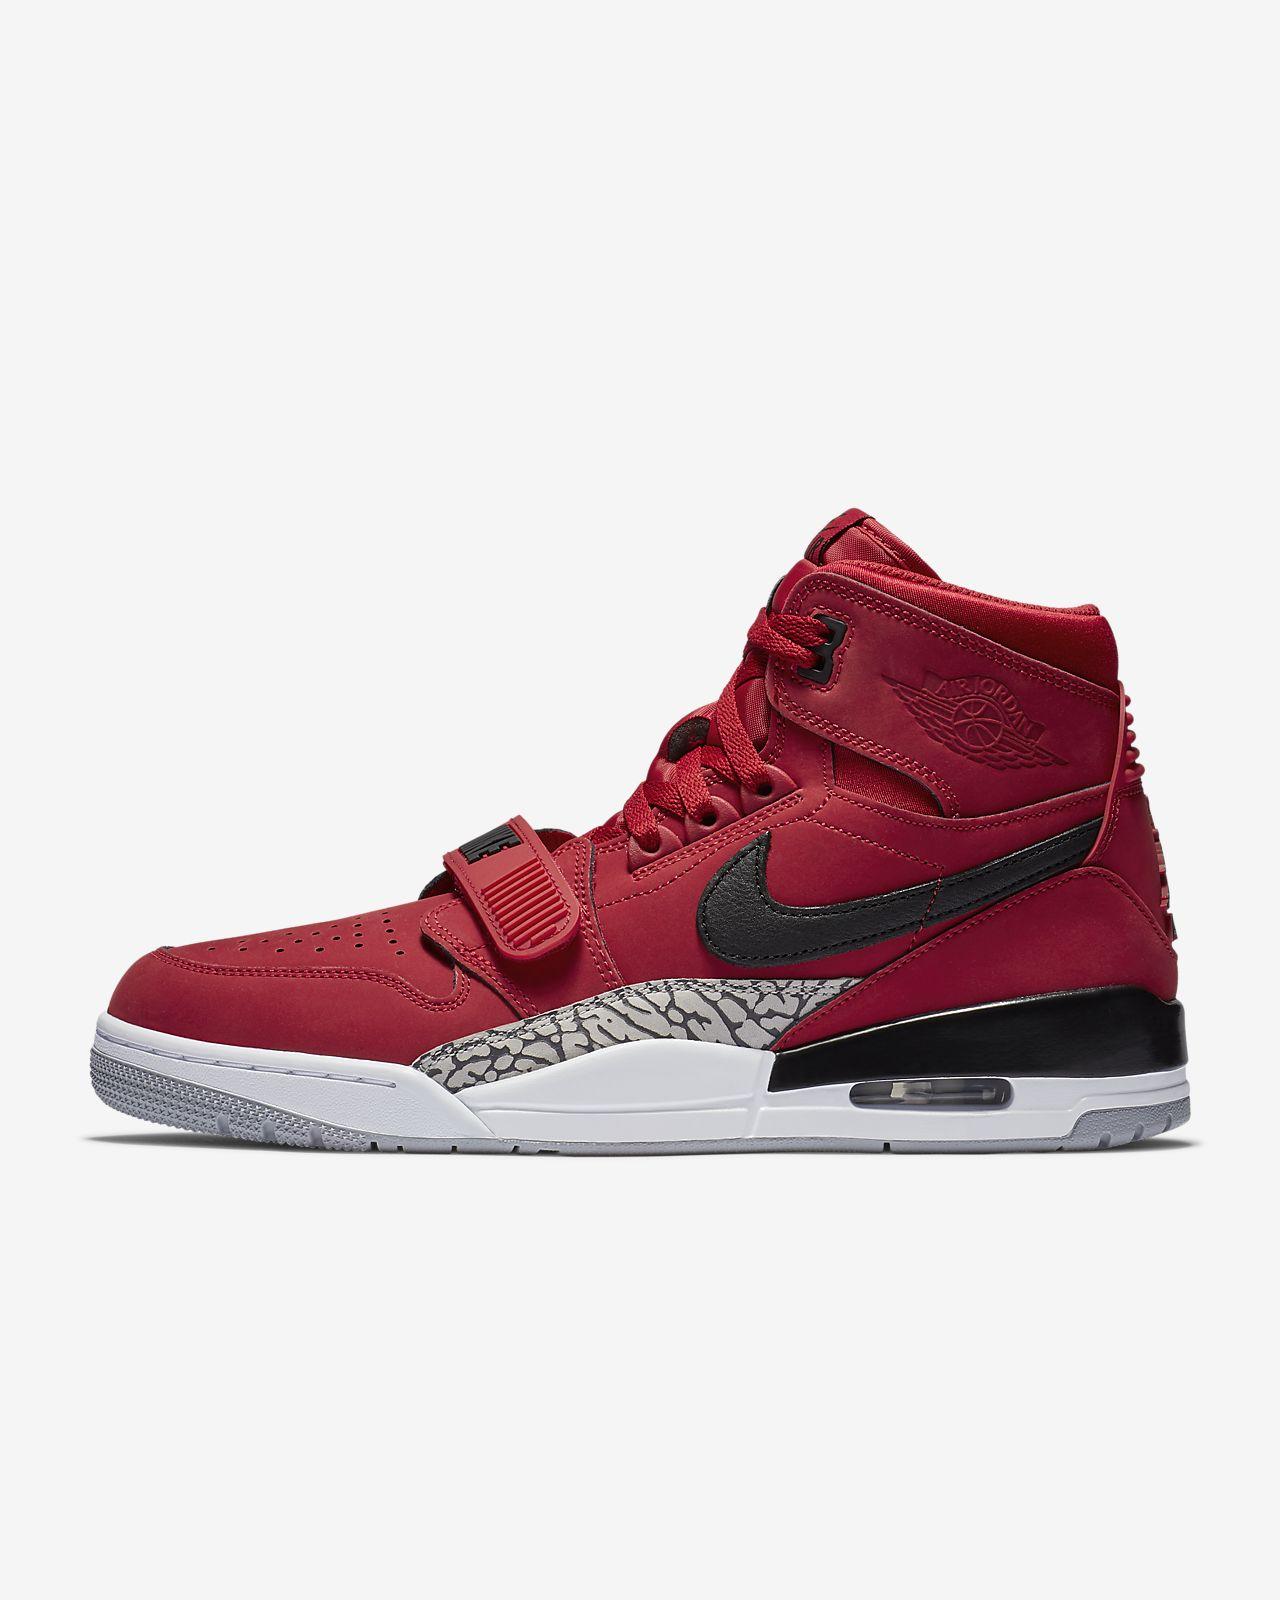 buy online d7fd0 d780b wholesale air jordan legacy 312 mens shoe 3f78f 211c2